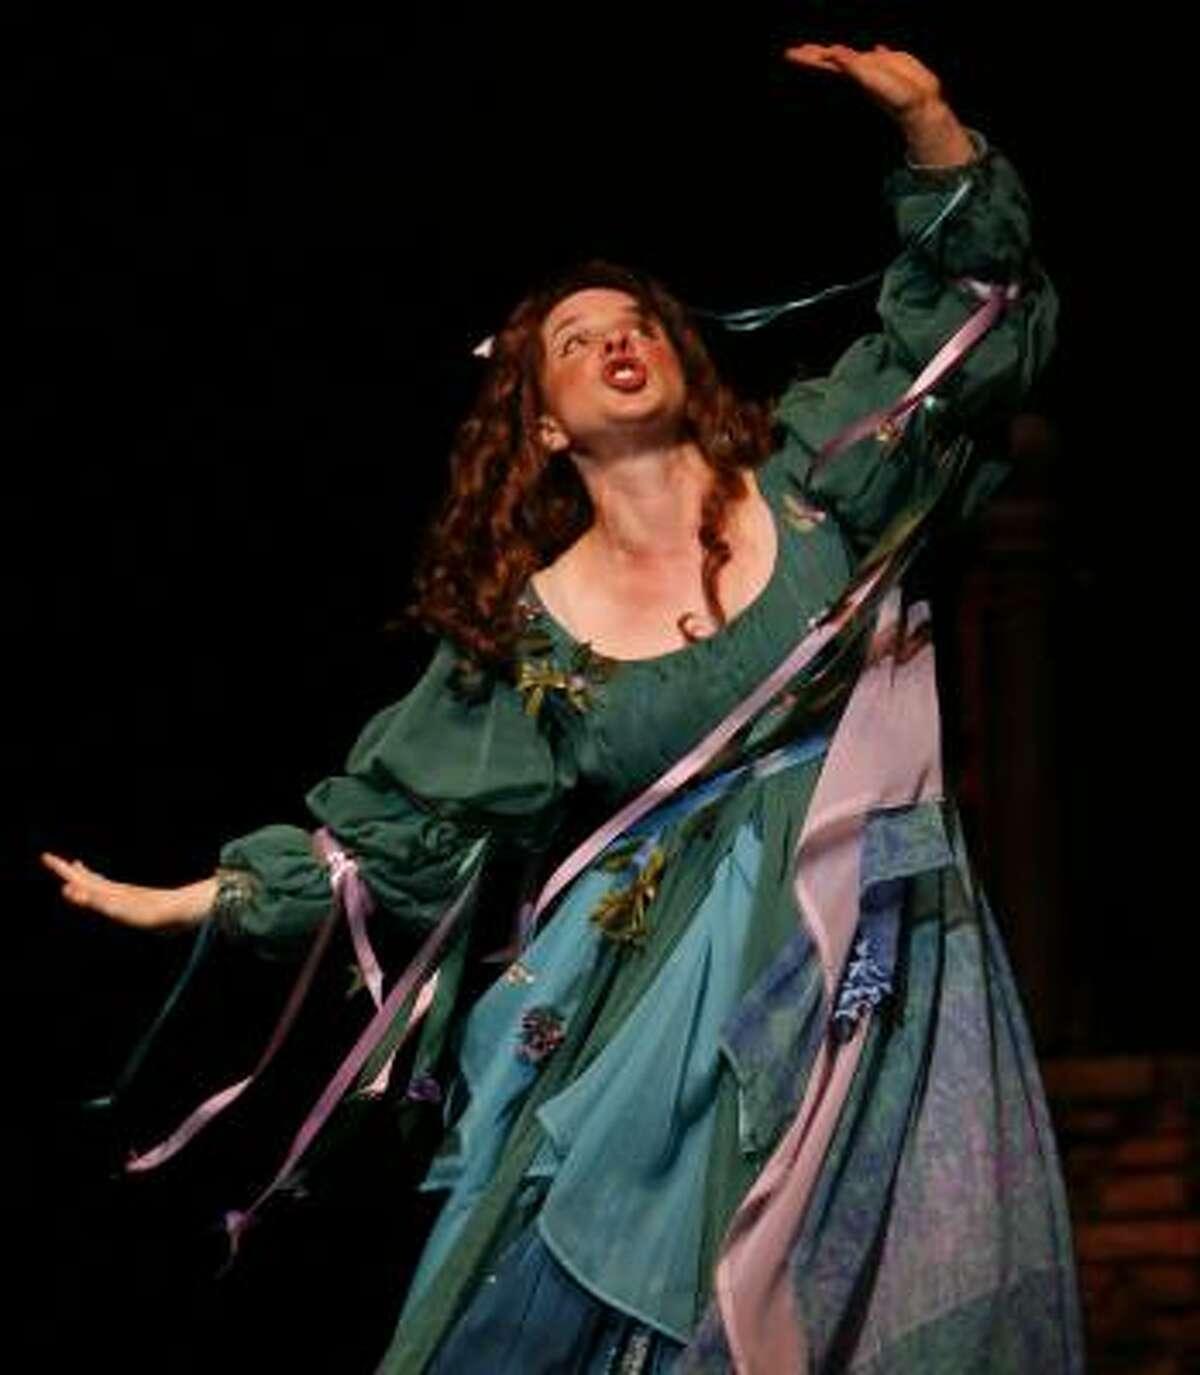 Mad Margaret (Kimberly Fuseilier) isn't crazed, just love-sick, in Gilbert & Sullivan's Ruddygore.